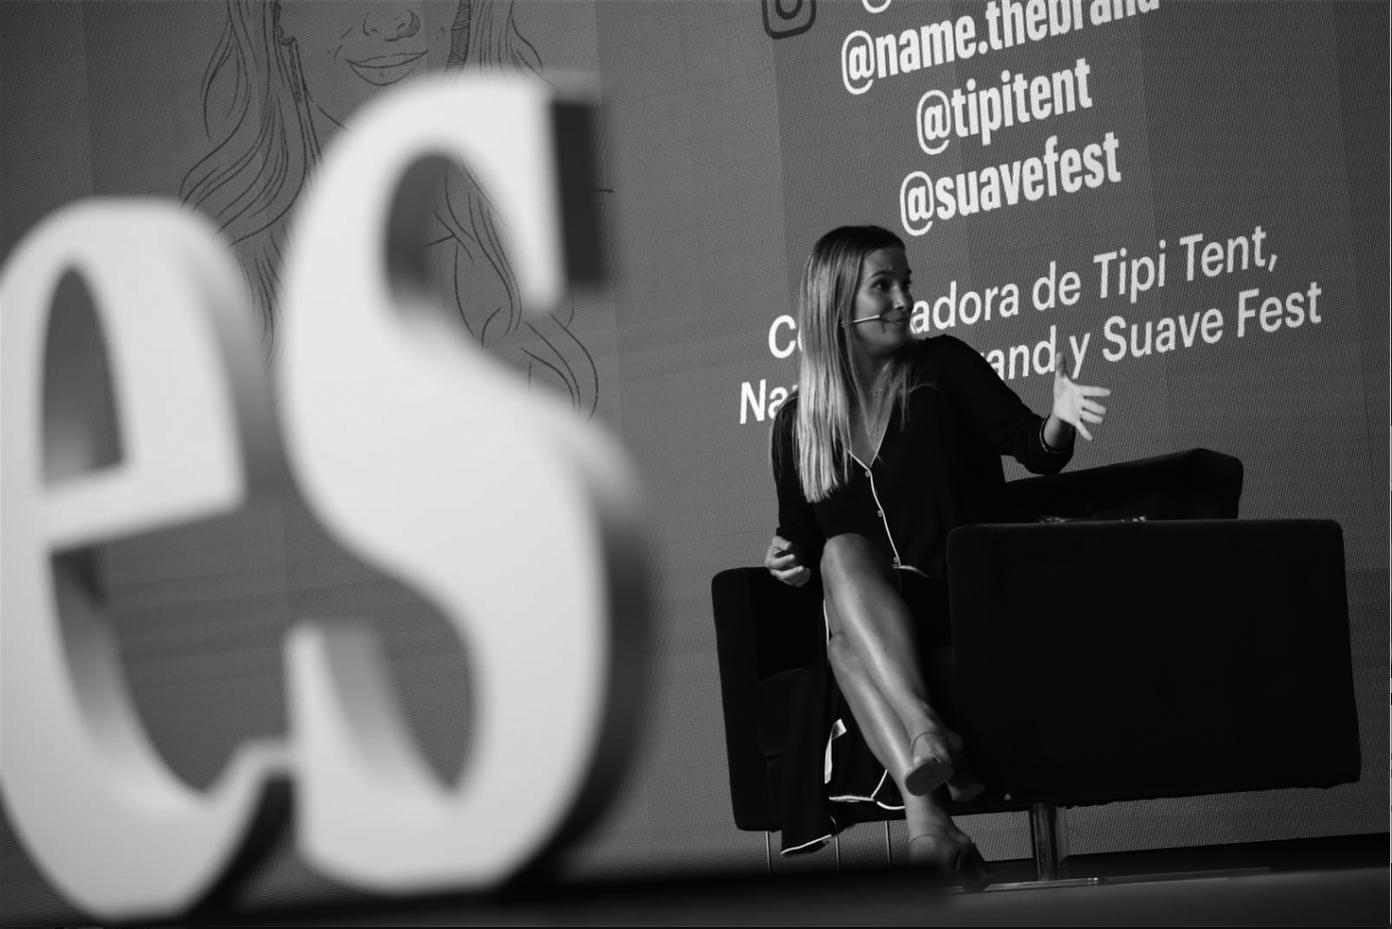 María Pombo, Cofundadora de Tipi Tent, Name The Brand y Suave Fest